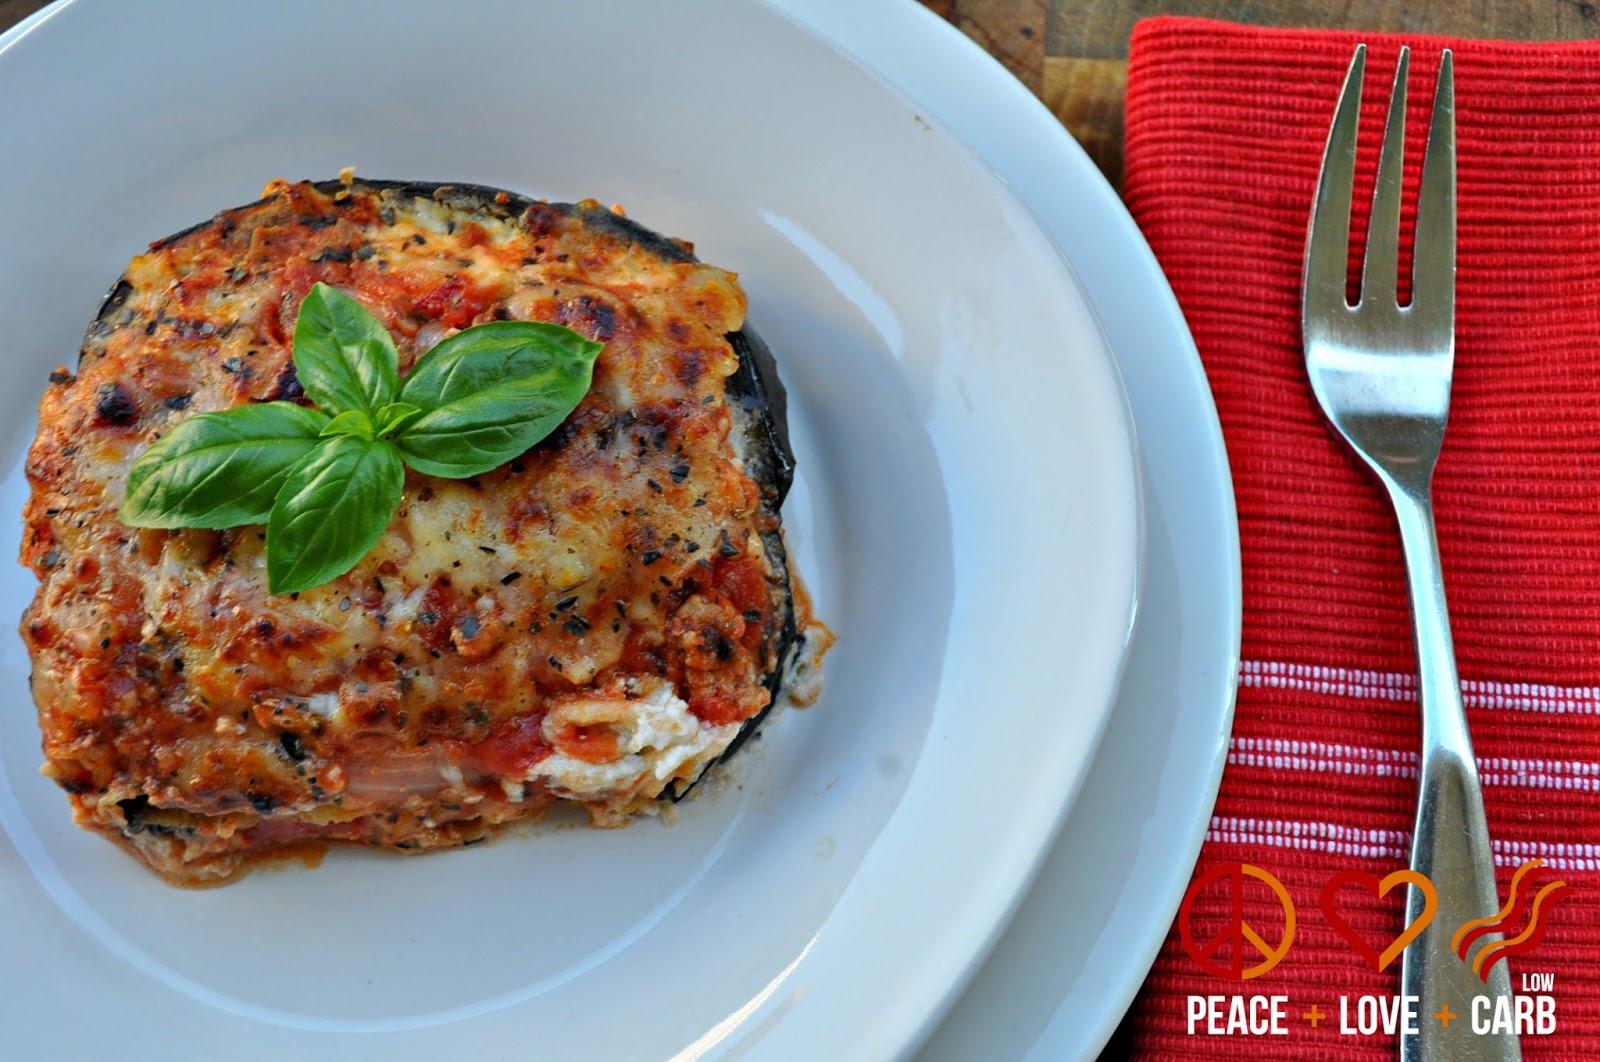 Peace Love And Low Carb Lasagna  Eggplant Lasagna with Meat Sauce Low Carb Lasagna